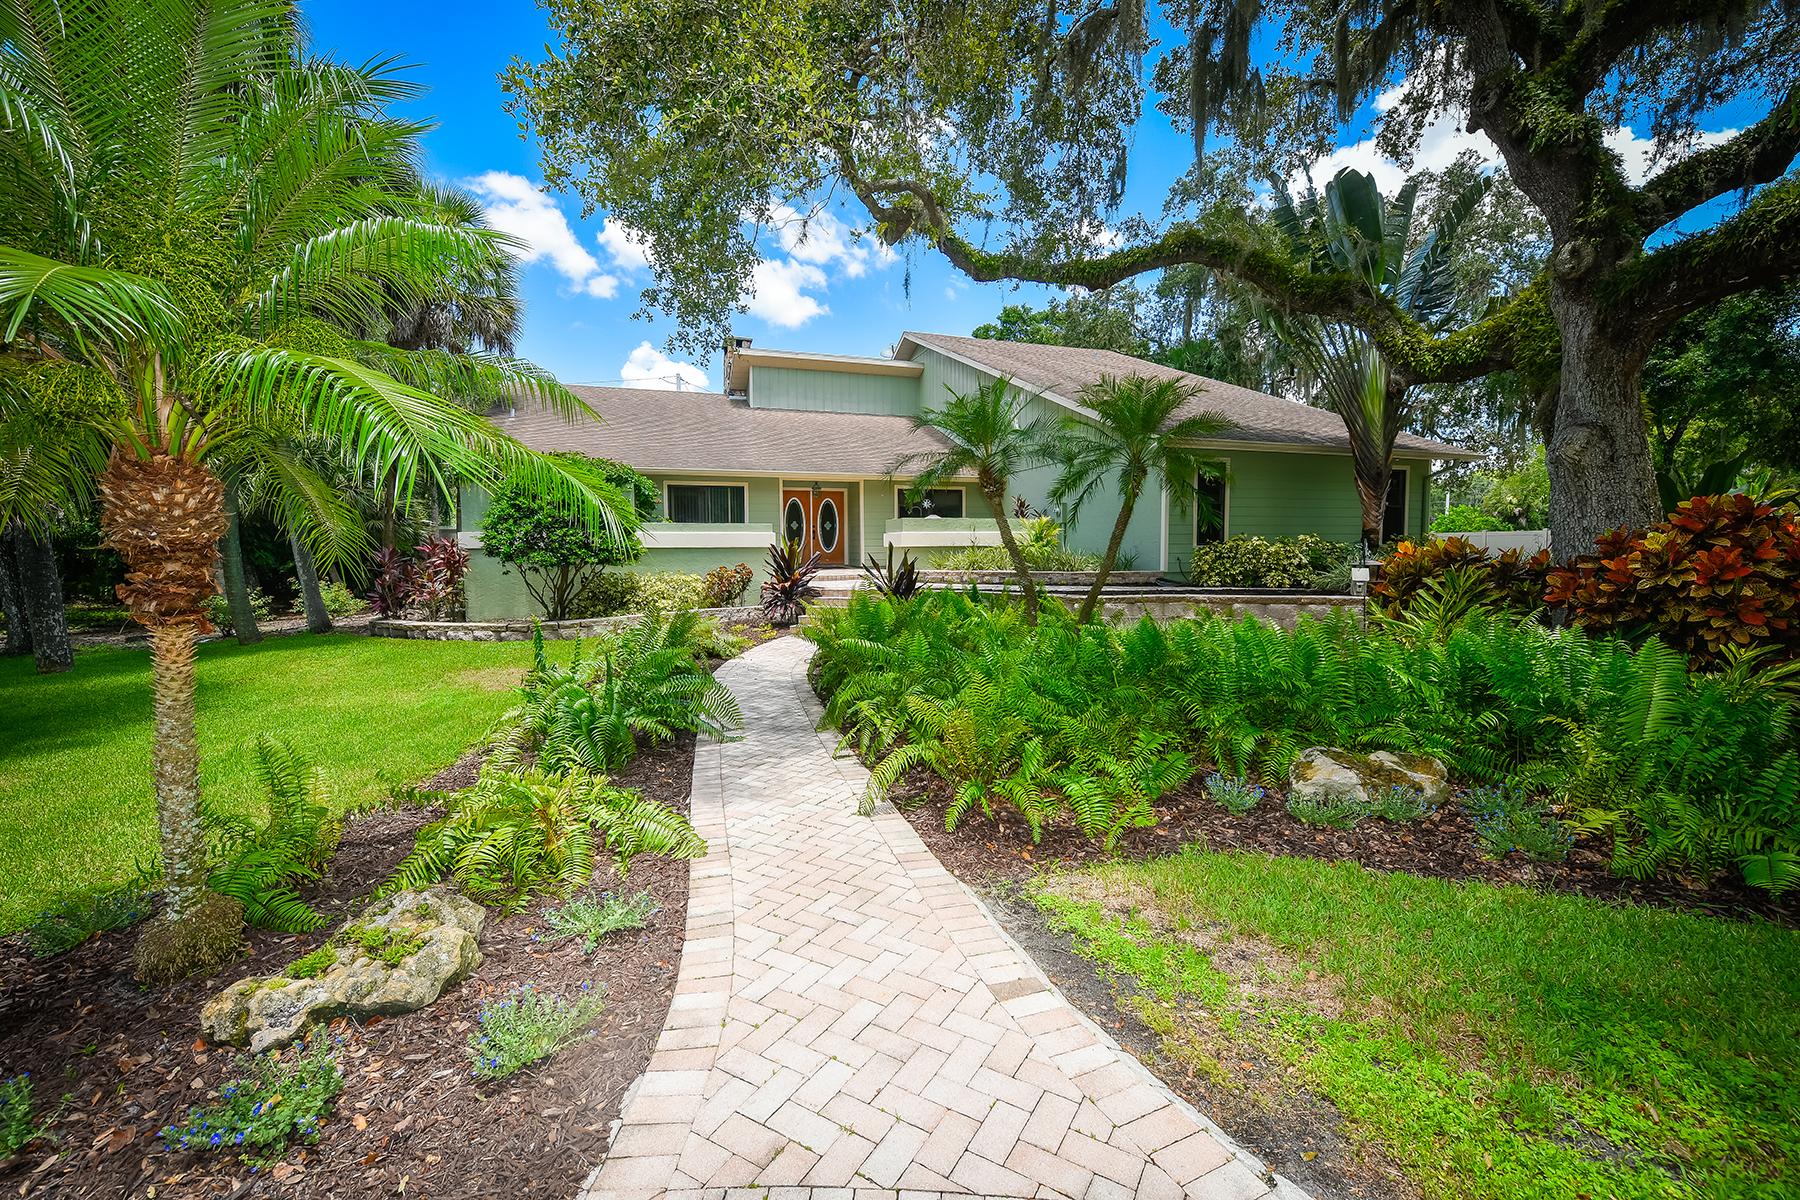 Vivienda unifamiliar por un Venta en HIDDEN OAKS ESTATES 4721 Stone Ridge Trl Sarasota, Florida, 34232 Estados Unidos